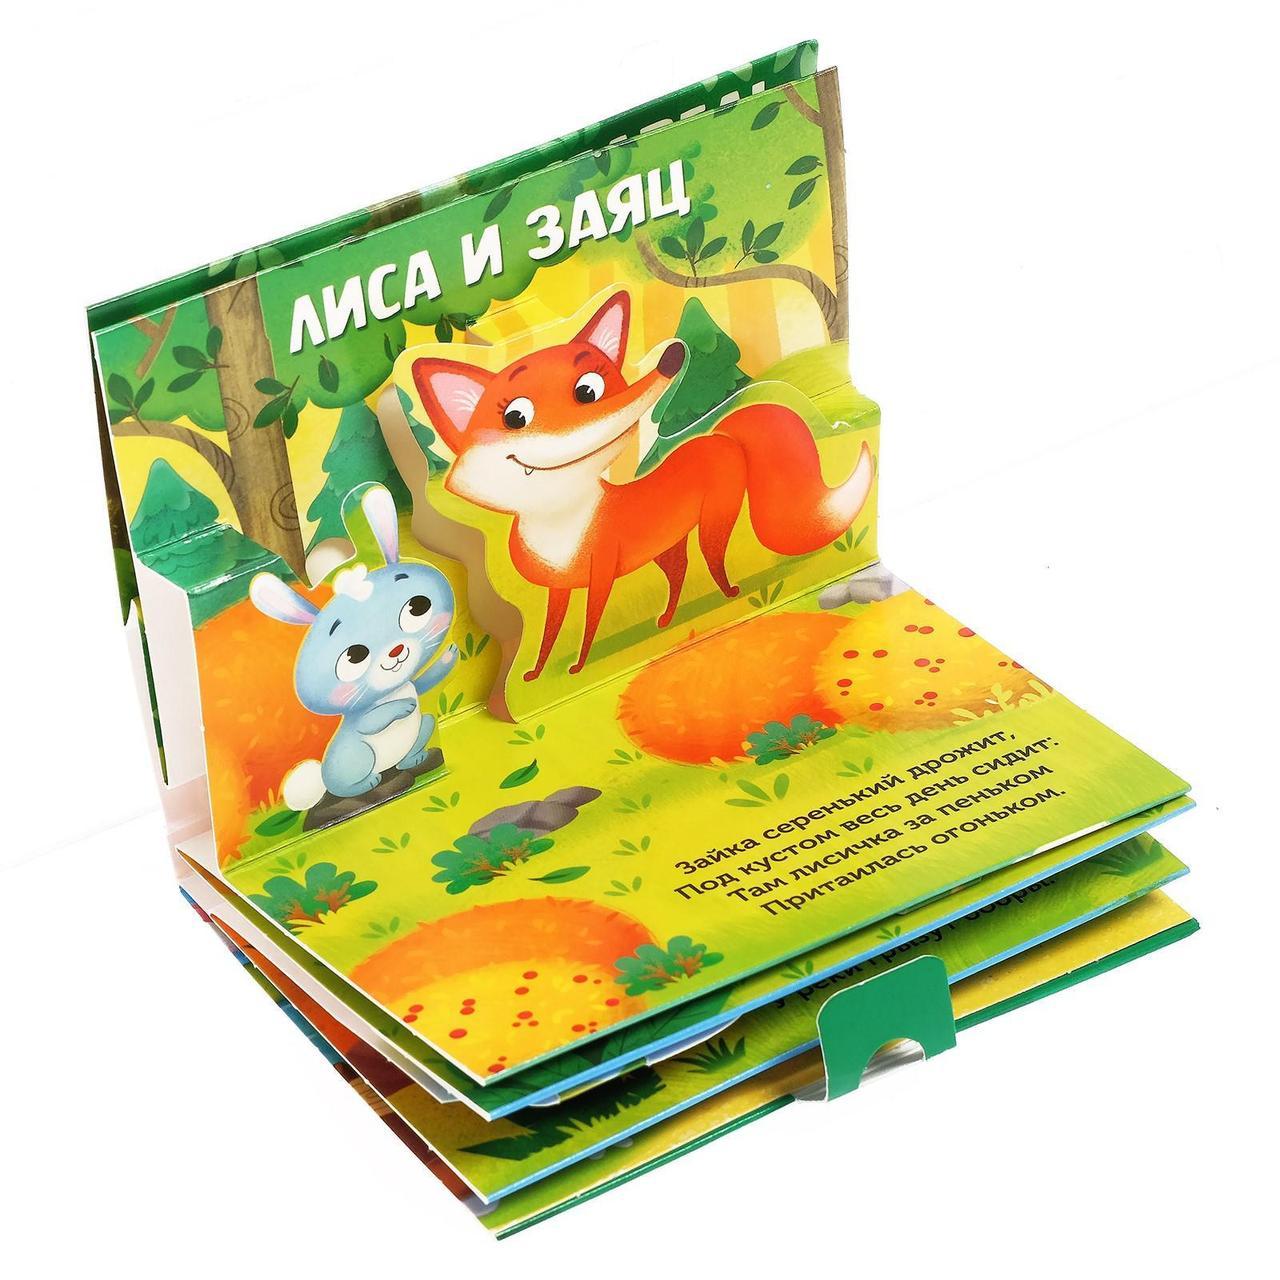 Книжки-панорамки 3D набор «Животные леса и зоопарка» 2 шт по 12 стр.